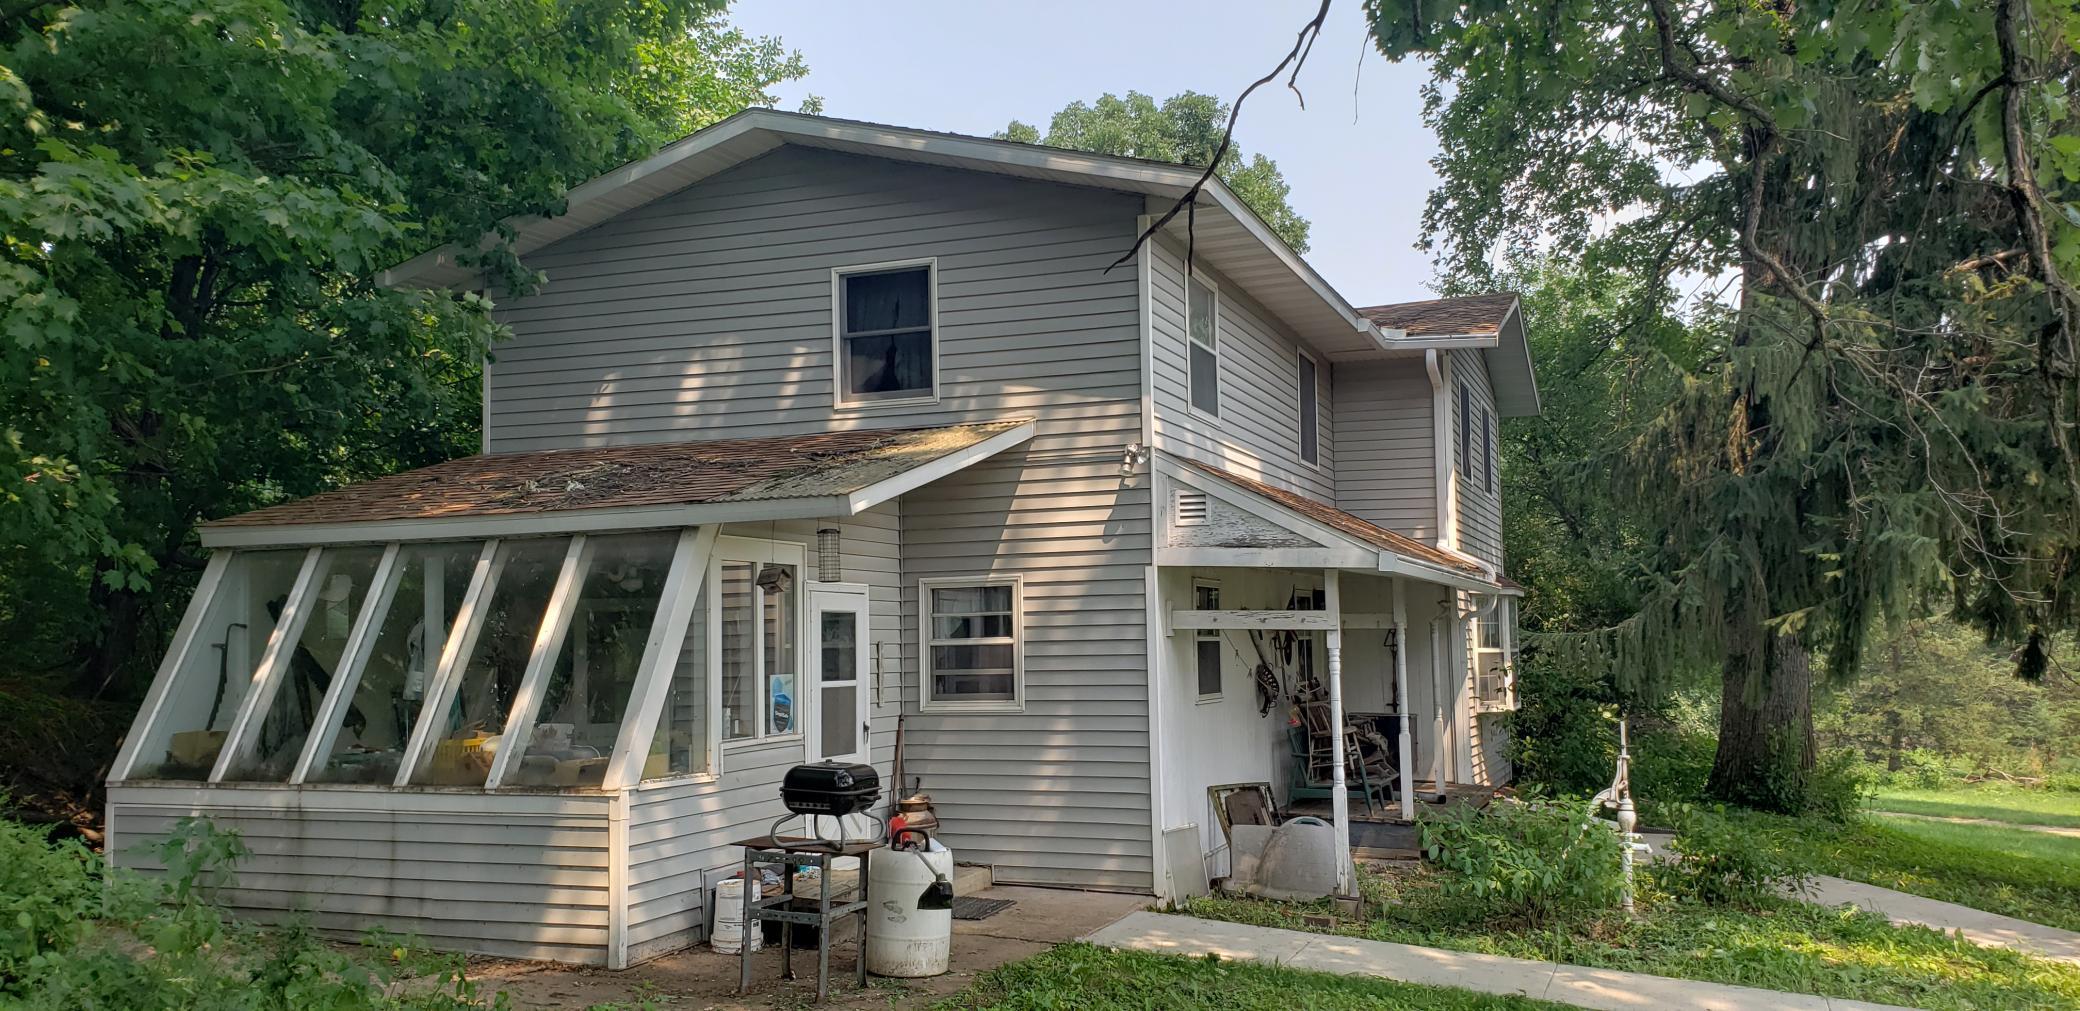 N7157 820th Street Property Photo